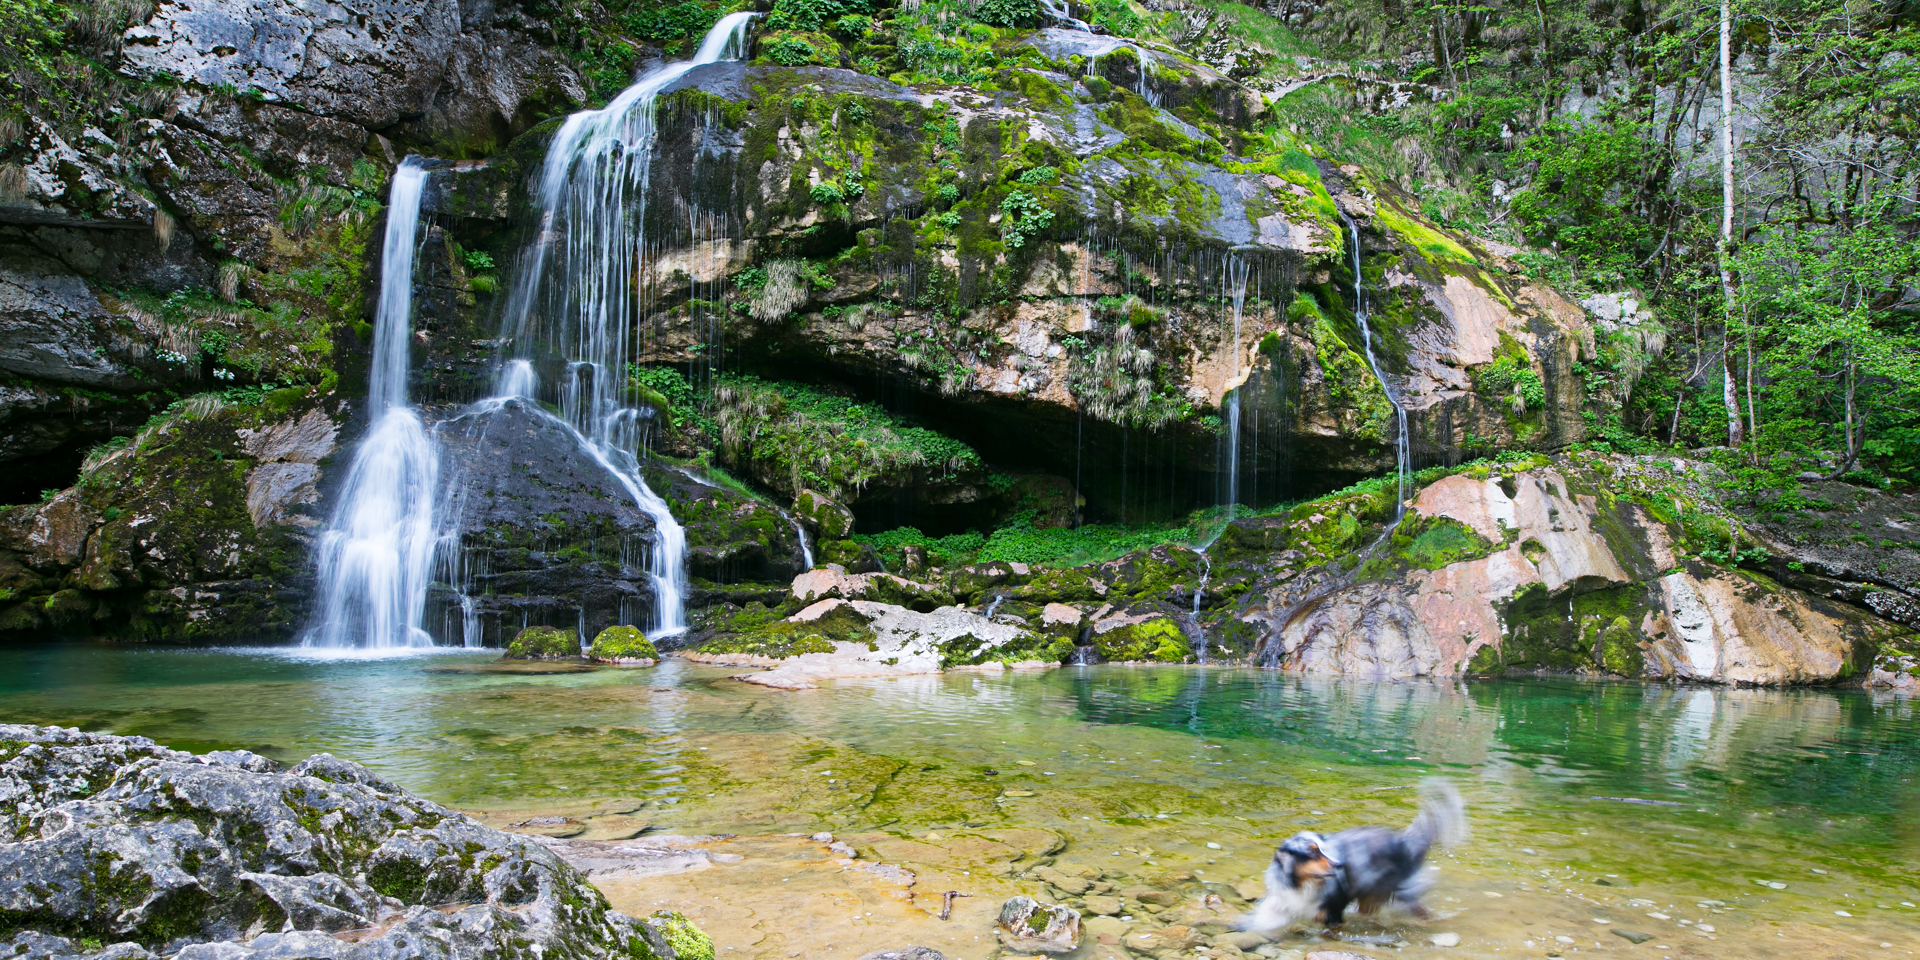 slovenia-photo-tours-bovec-mangart-saddle-2